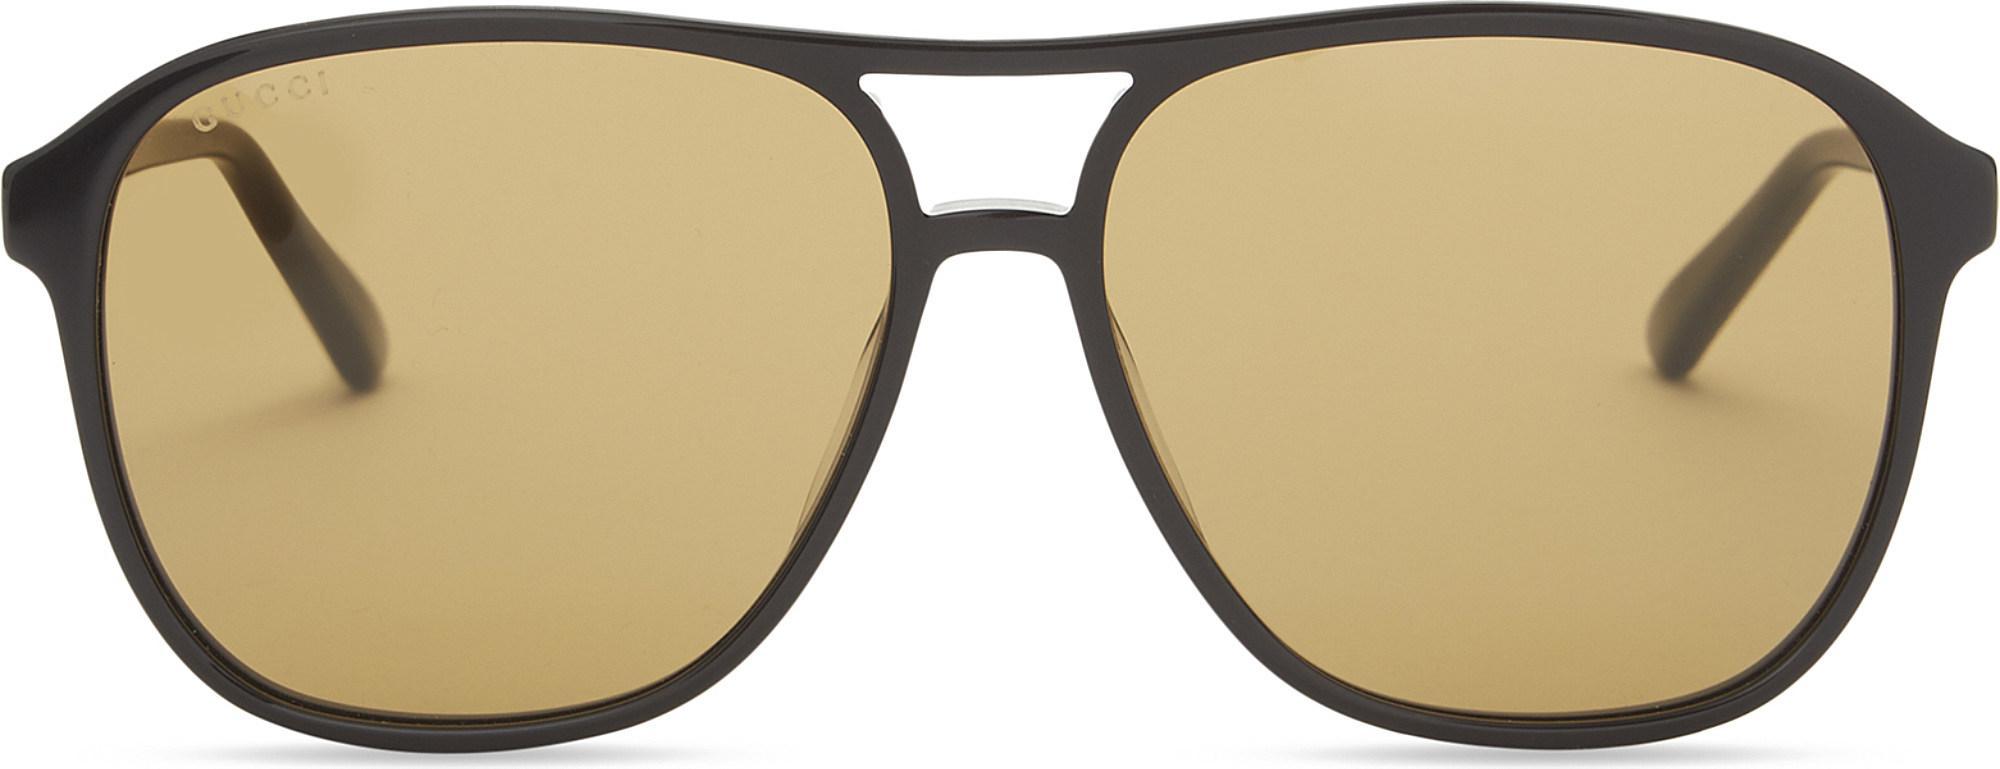 7214d3ecb48 Gucci Gg0016s Square-frame Sunglasses in Black - Lyst